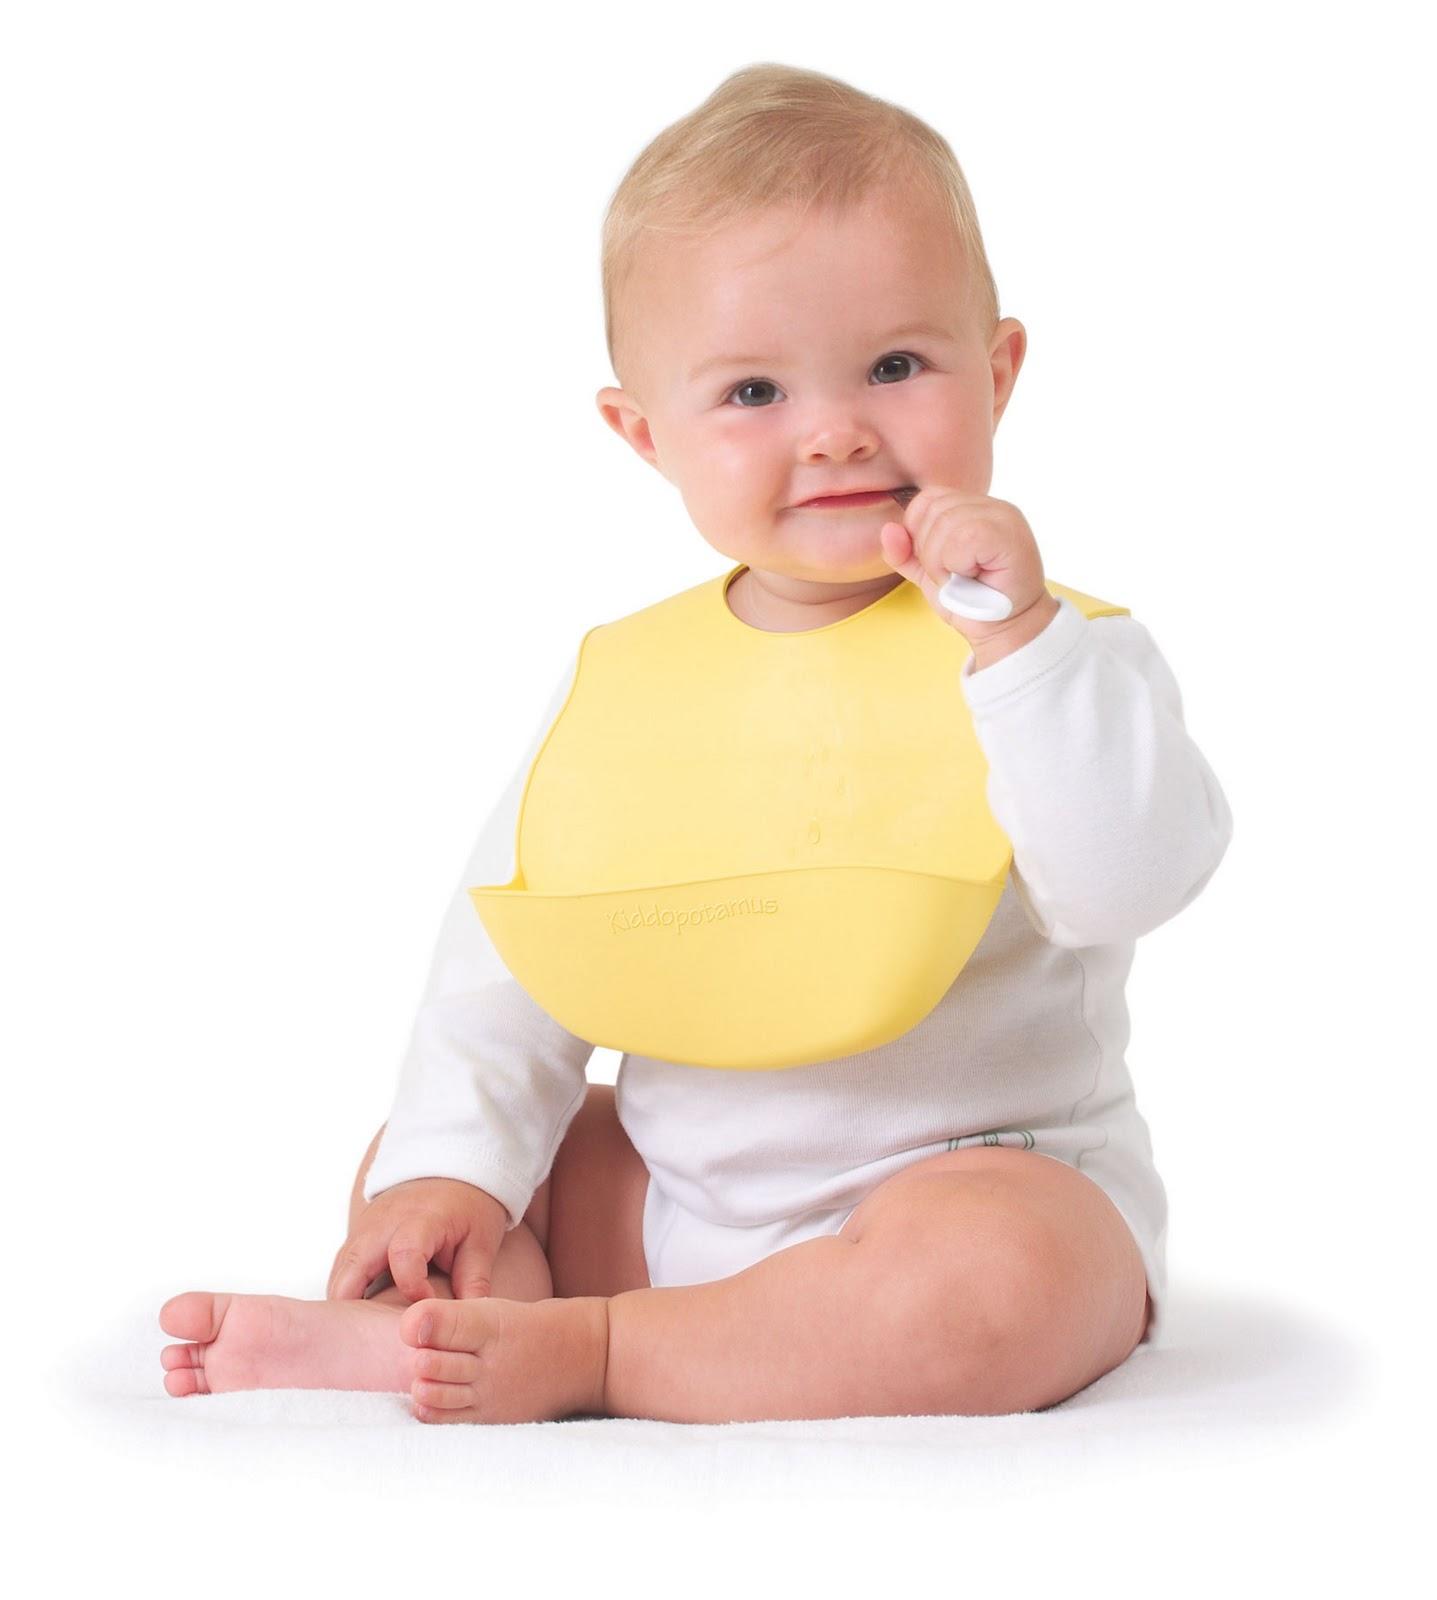 http://1.bp.blogspot.com/_SsEWHn8KJt8/TTwPIbF-_xI/AAAAAAAAAV8/BJCrDw5hb54/s1600/baby+%25284%2529.jpg